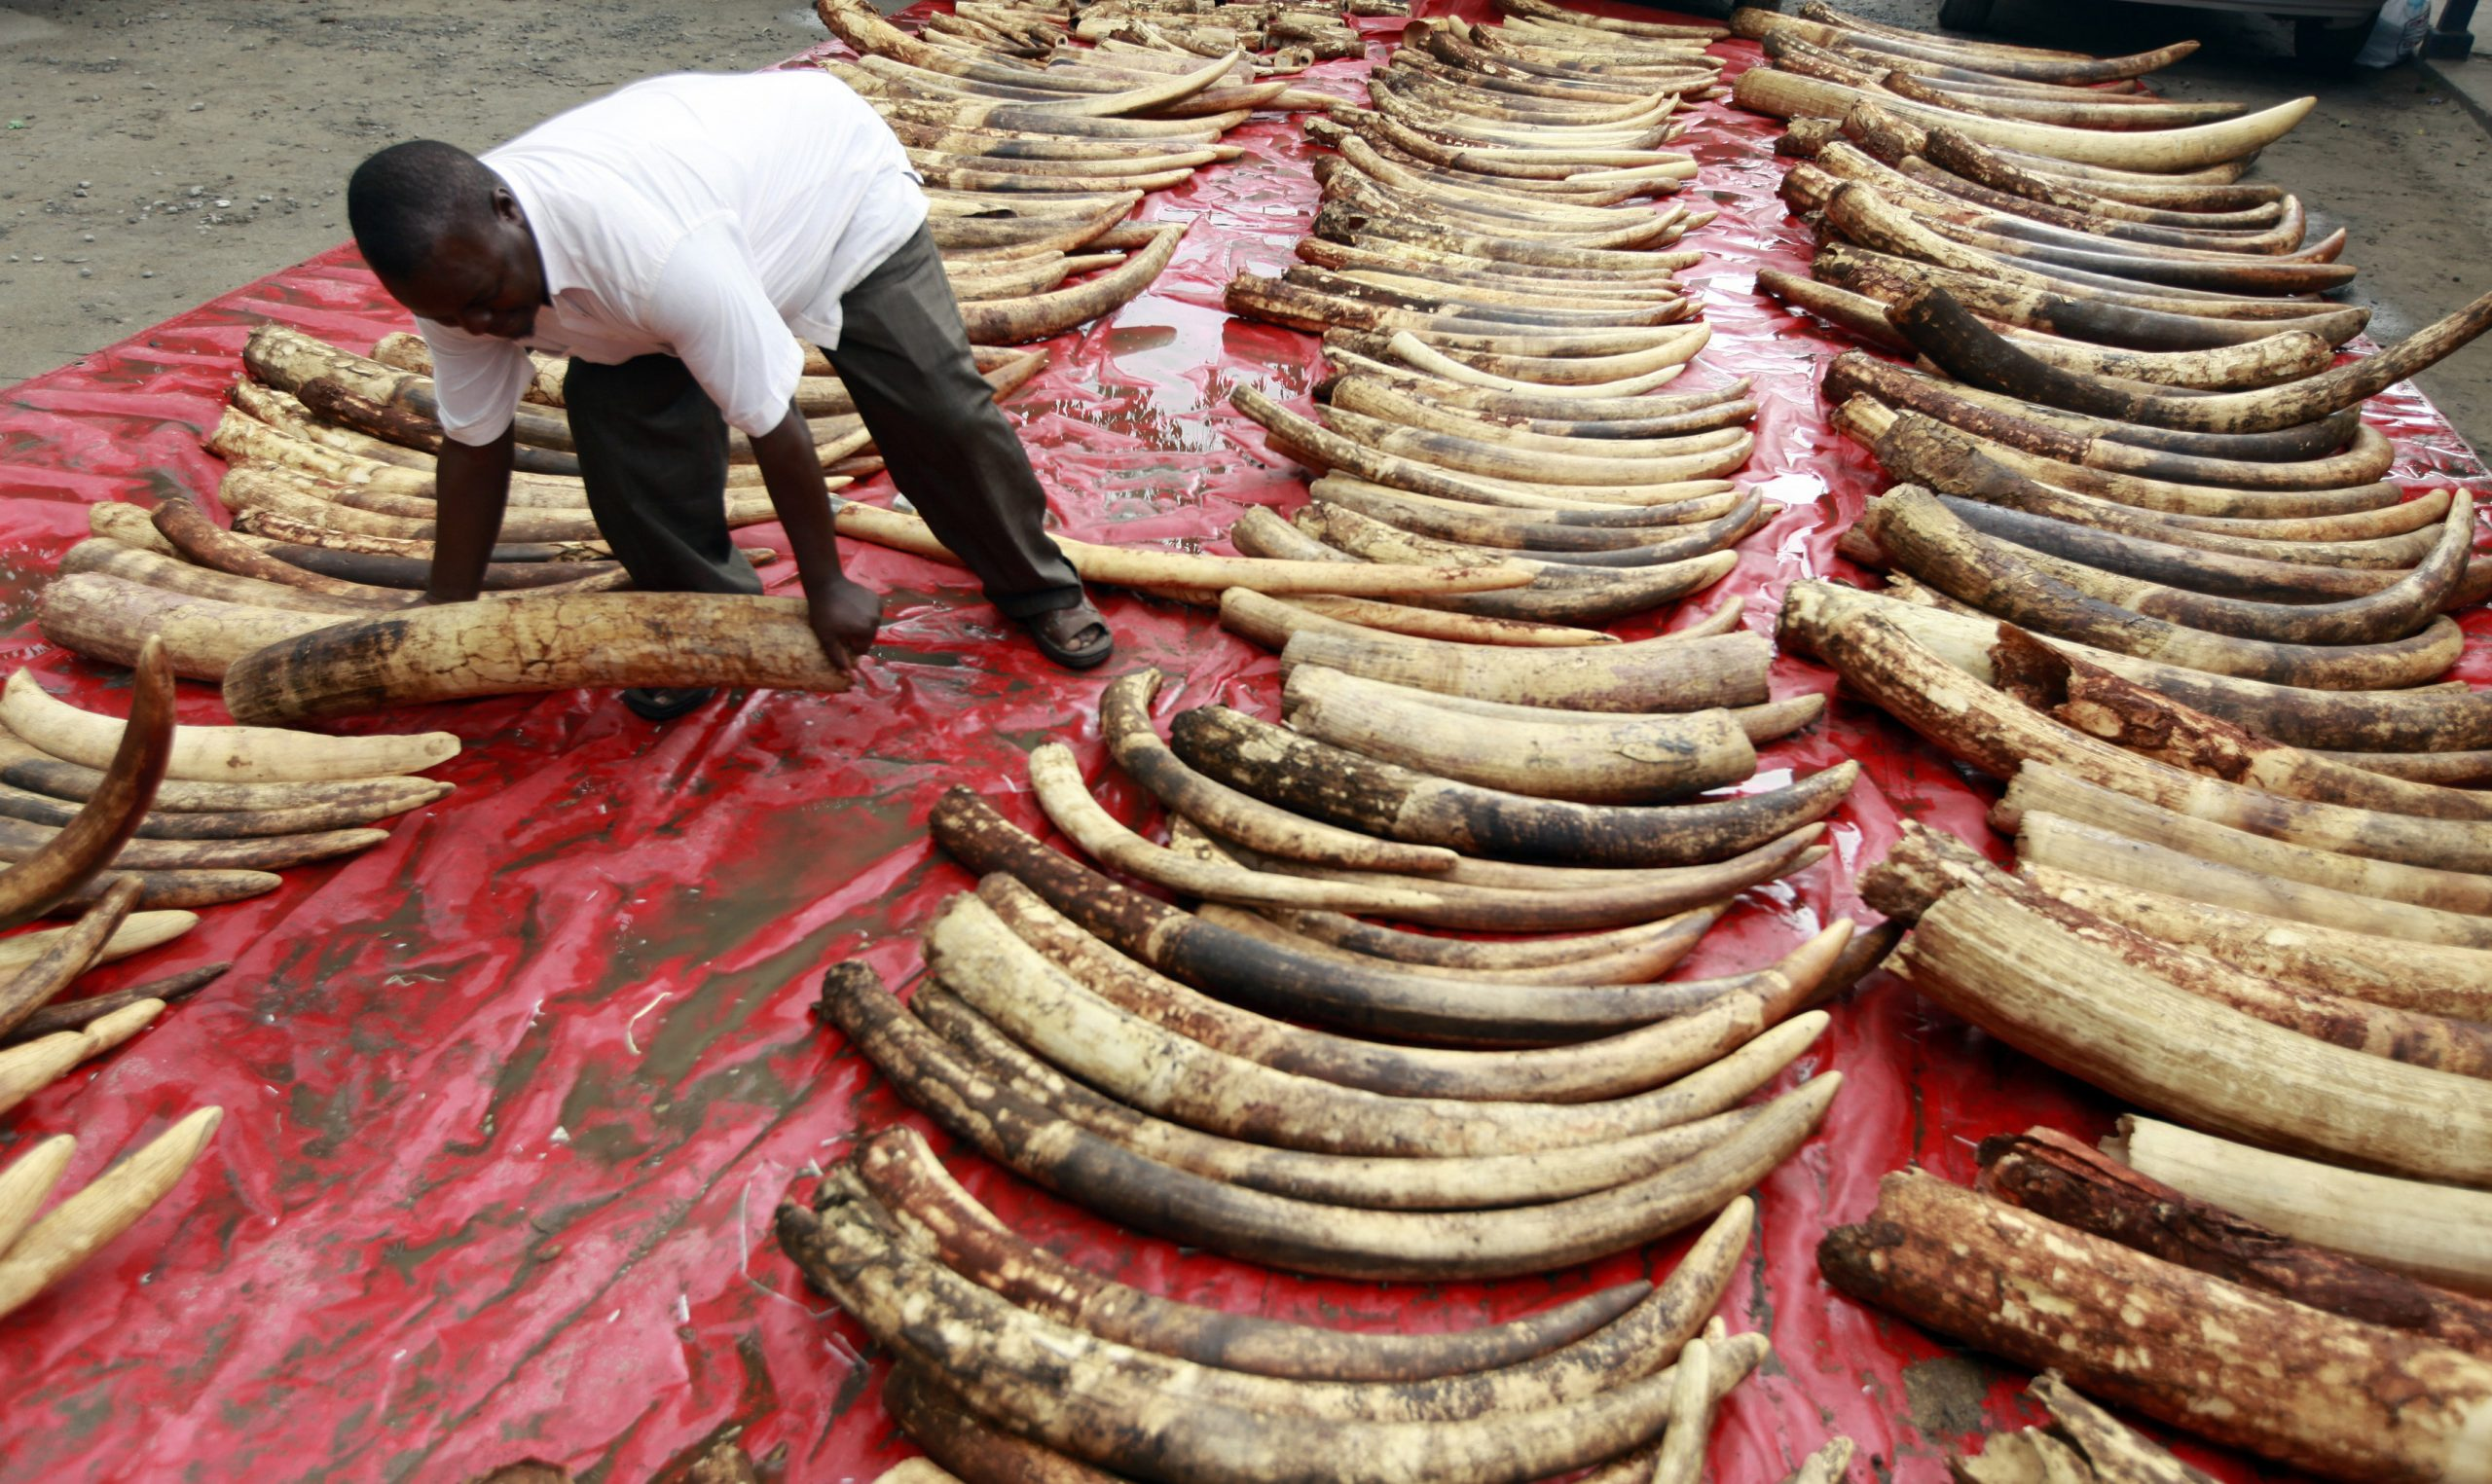 Wildlife trade: A reason for spread of COVID19